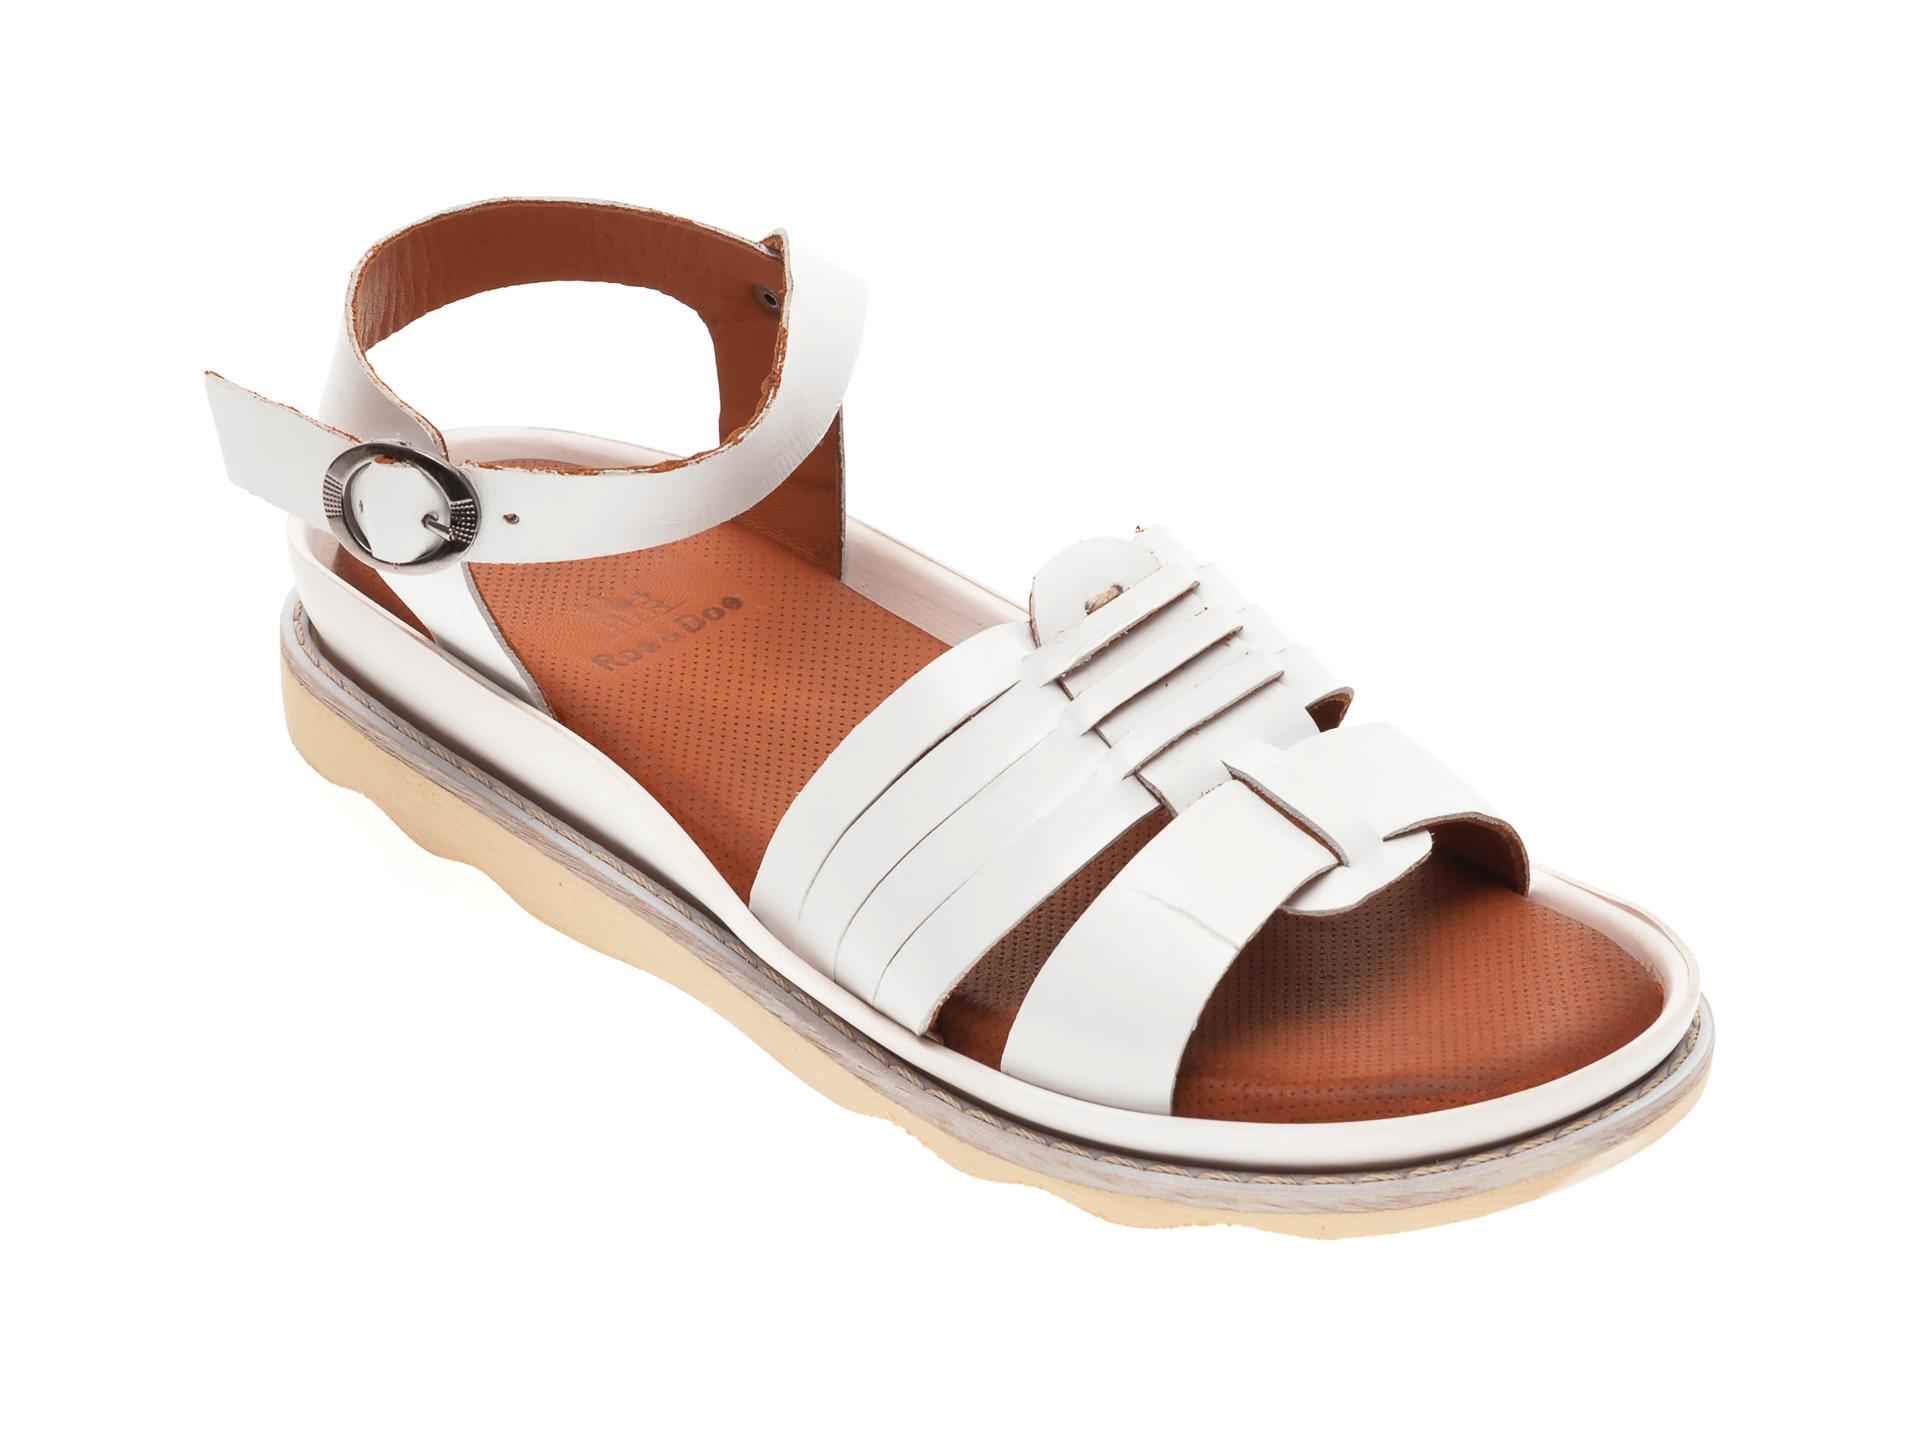 Sandale BABOOS albe, 0404, din piele naturala